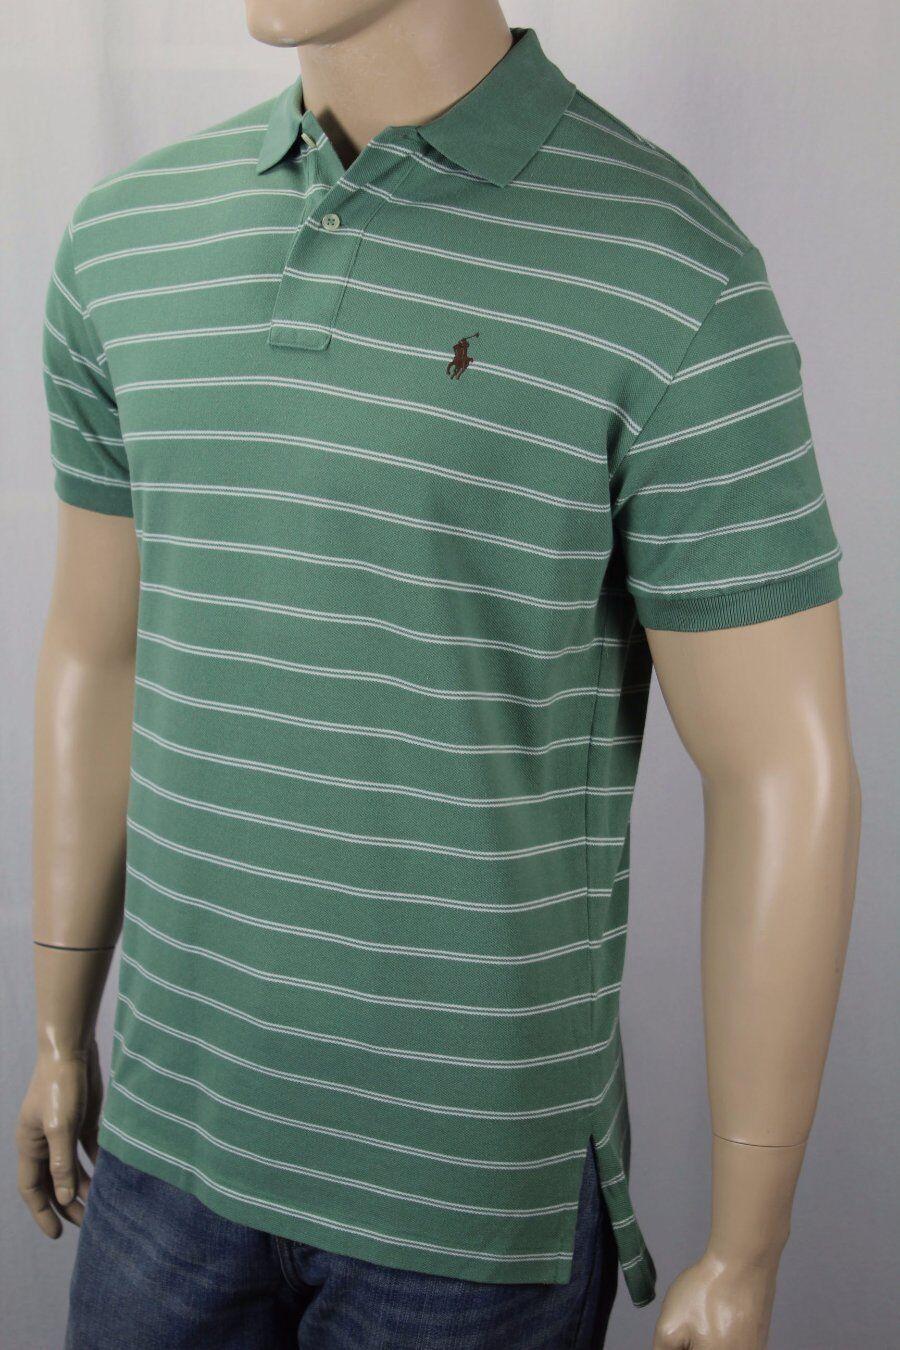 Polo Ralph Lauren Green Cream Striped Classic Fit Mesh Shirt Brown Pony NWT